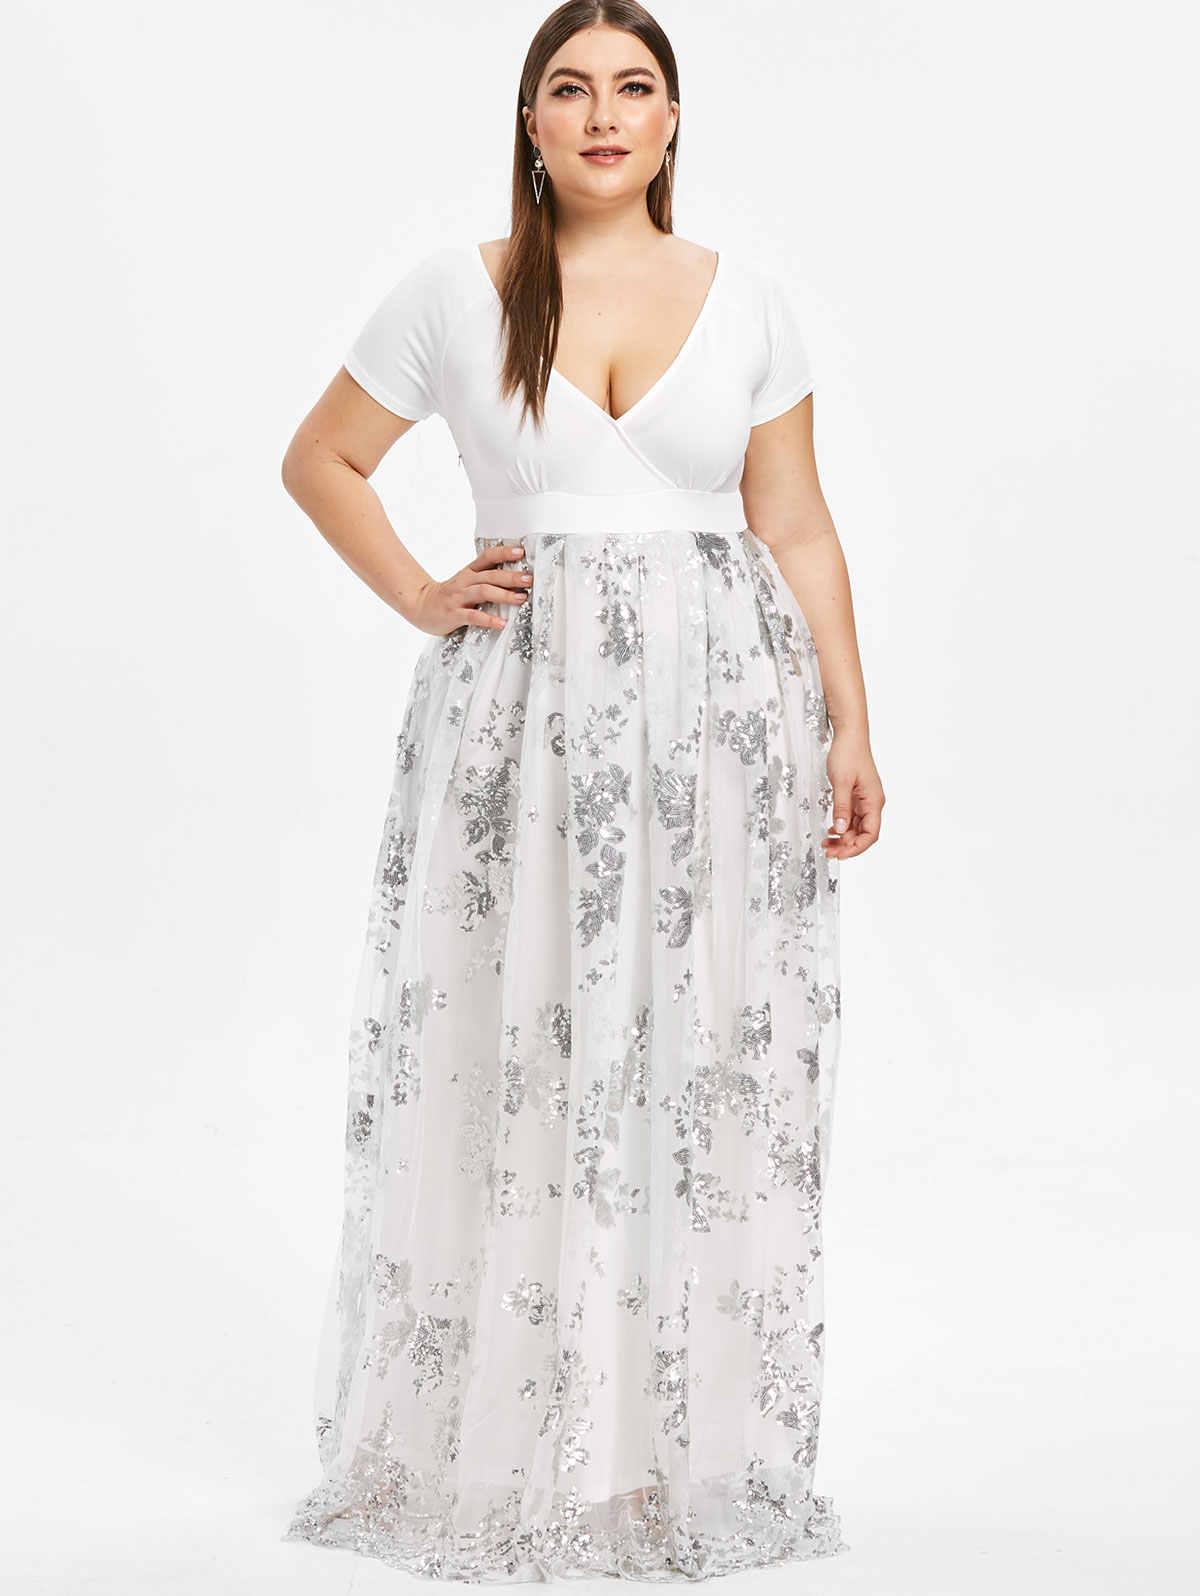 ... Wipalo Plus Size 5XL Dress Women Deep V Neck Short Sleeves Floral  Sparkly Maxi Dresses Elegant ... 49c989e48ef2